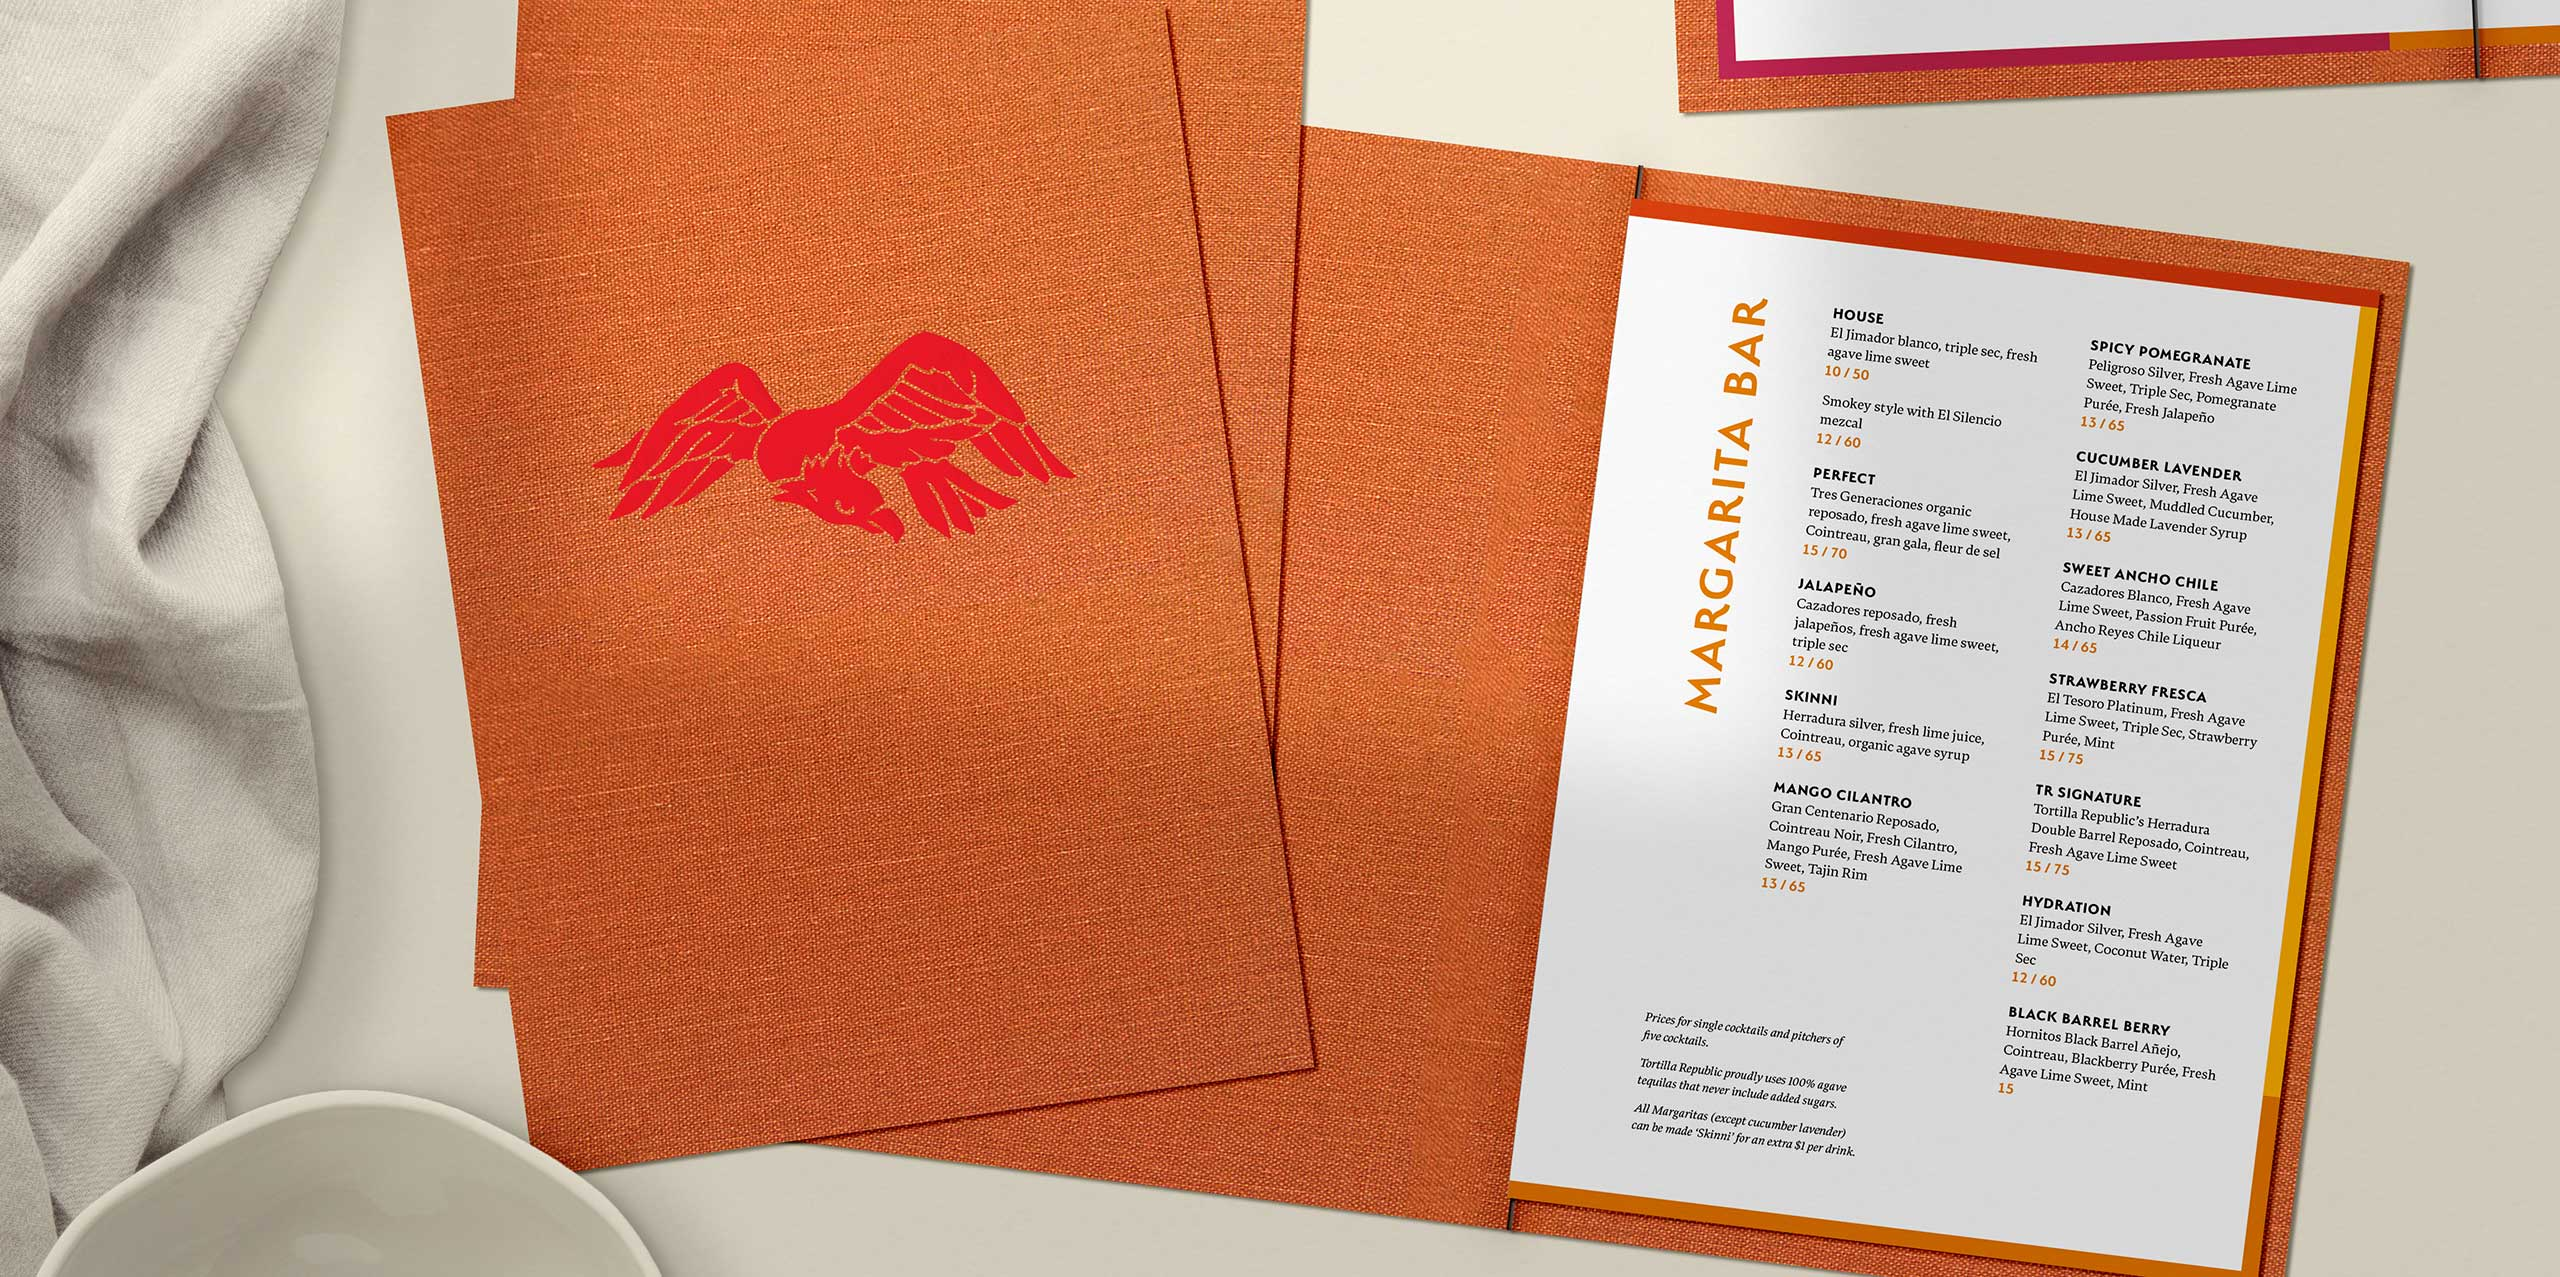 Tortilla Republic cocktail menu orange cover with eagle illustration